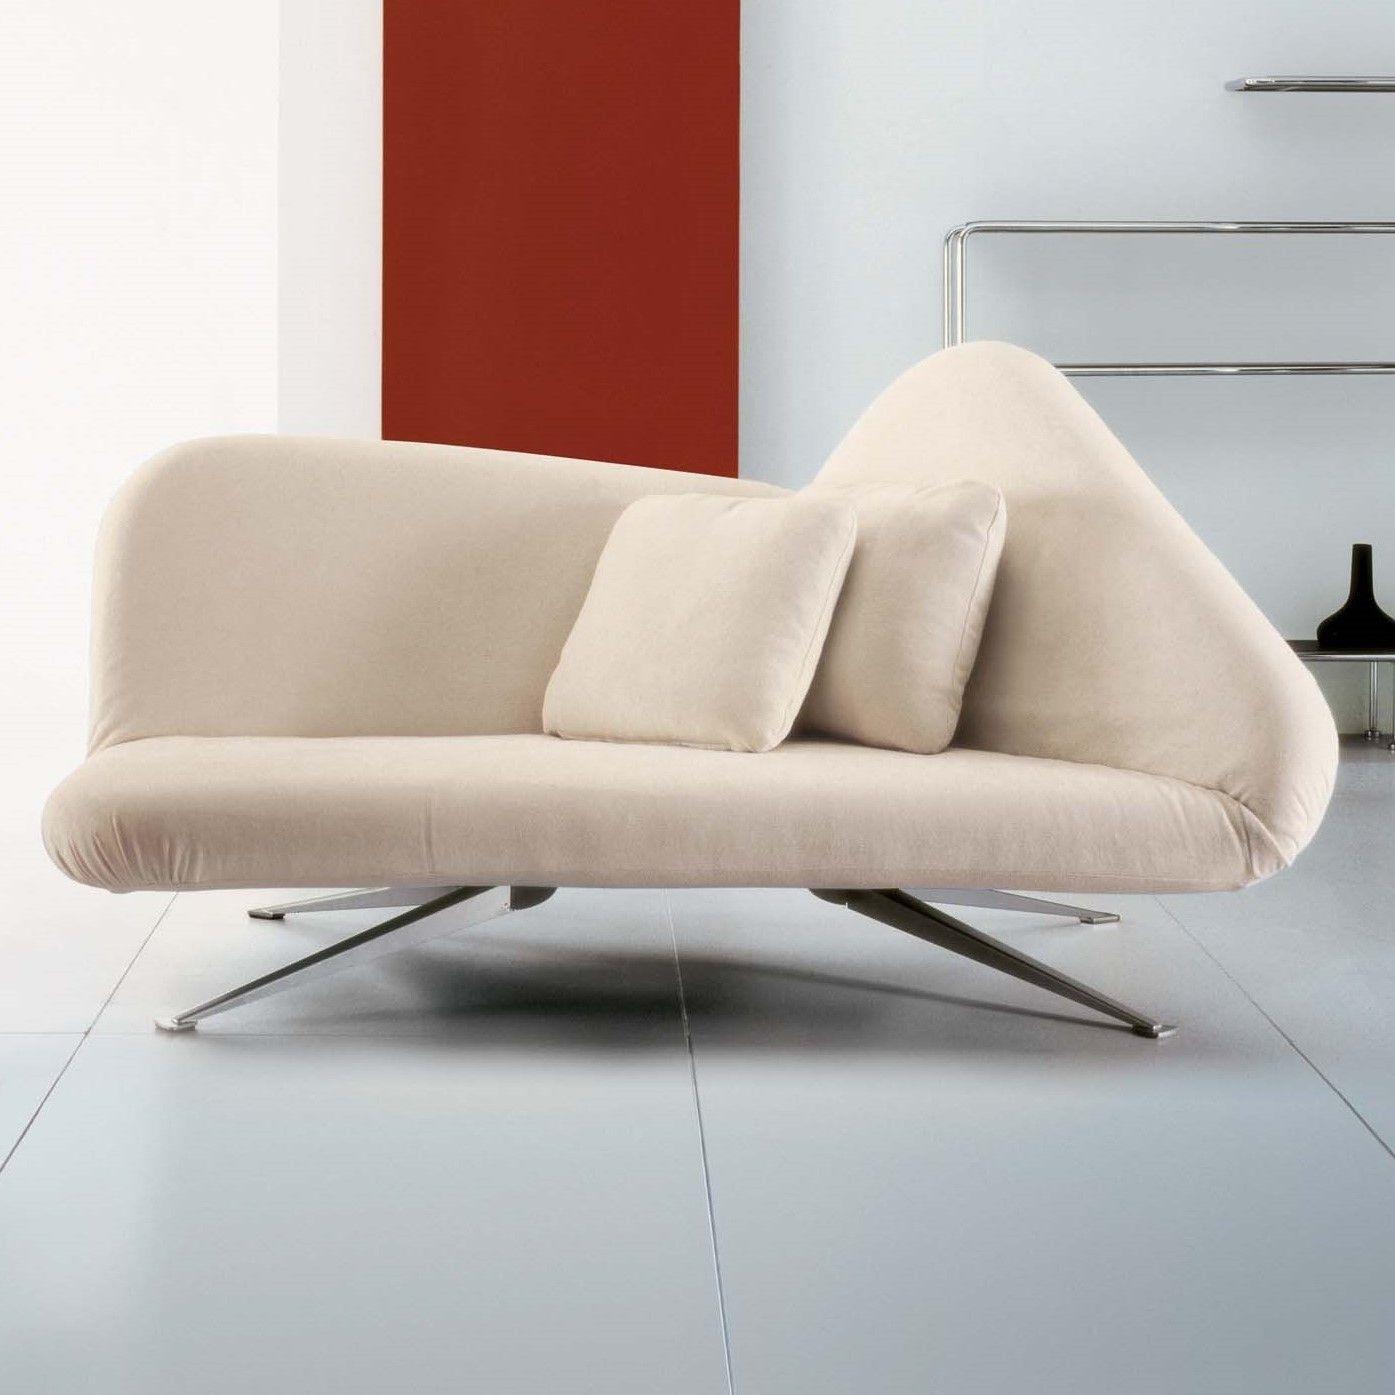 Papillon weißes Schlafsofa mit modernem Design – ARREDACLICK